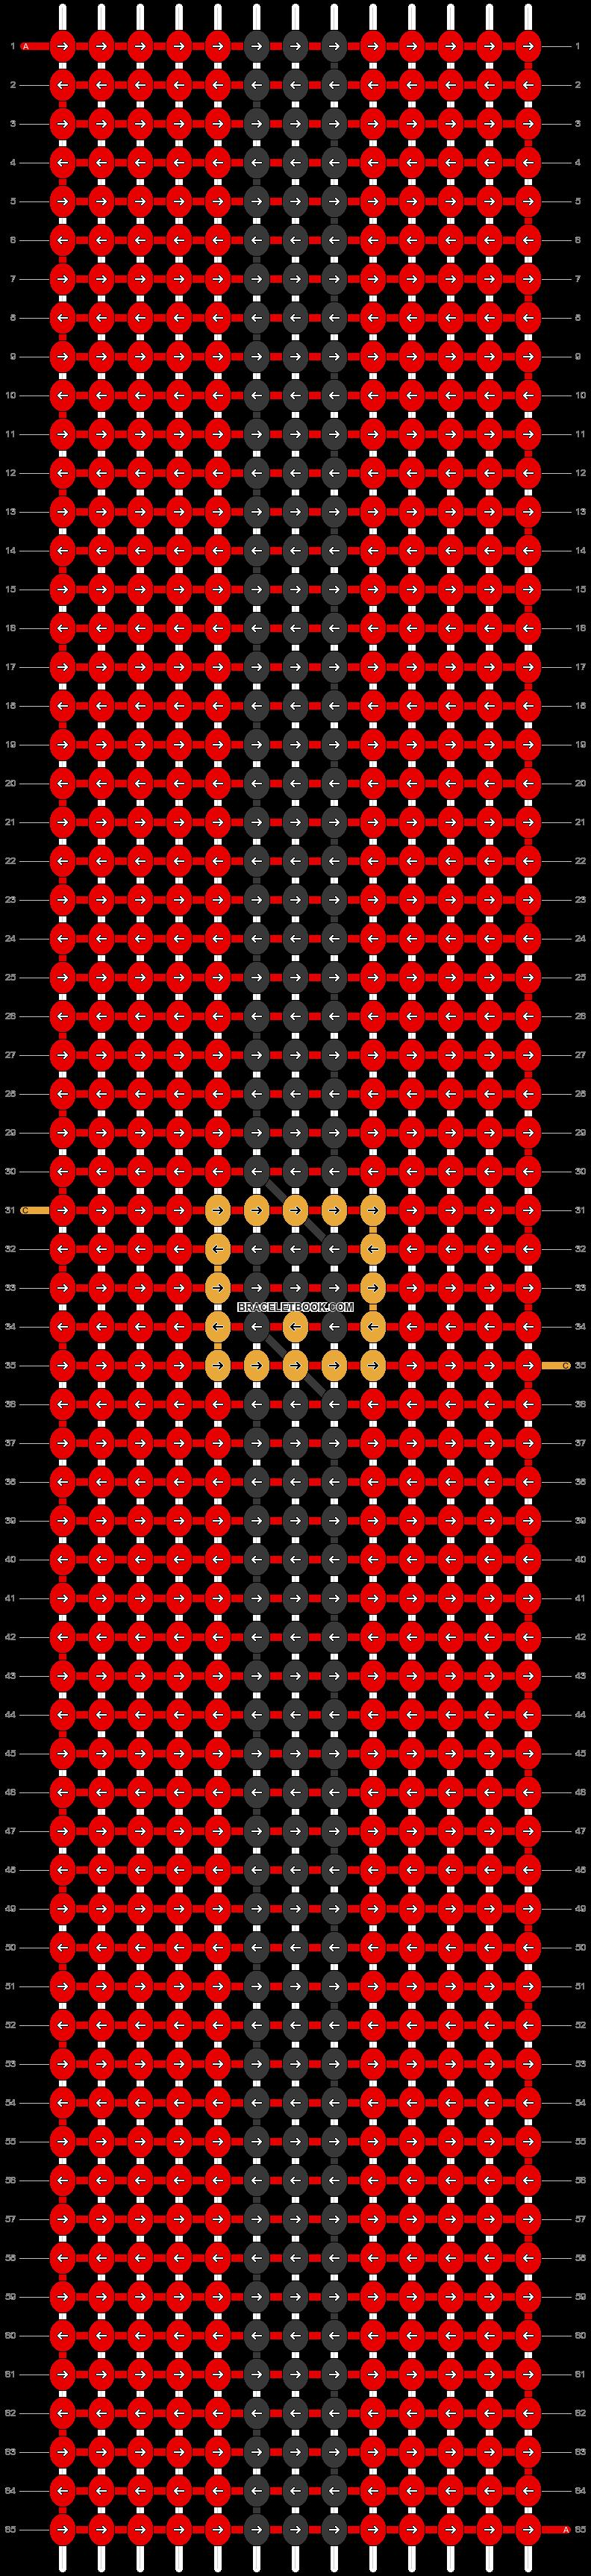 Alpha pattern #59449 pattern